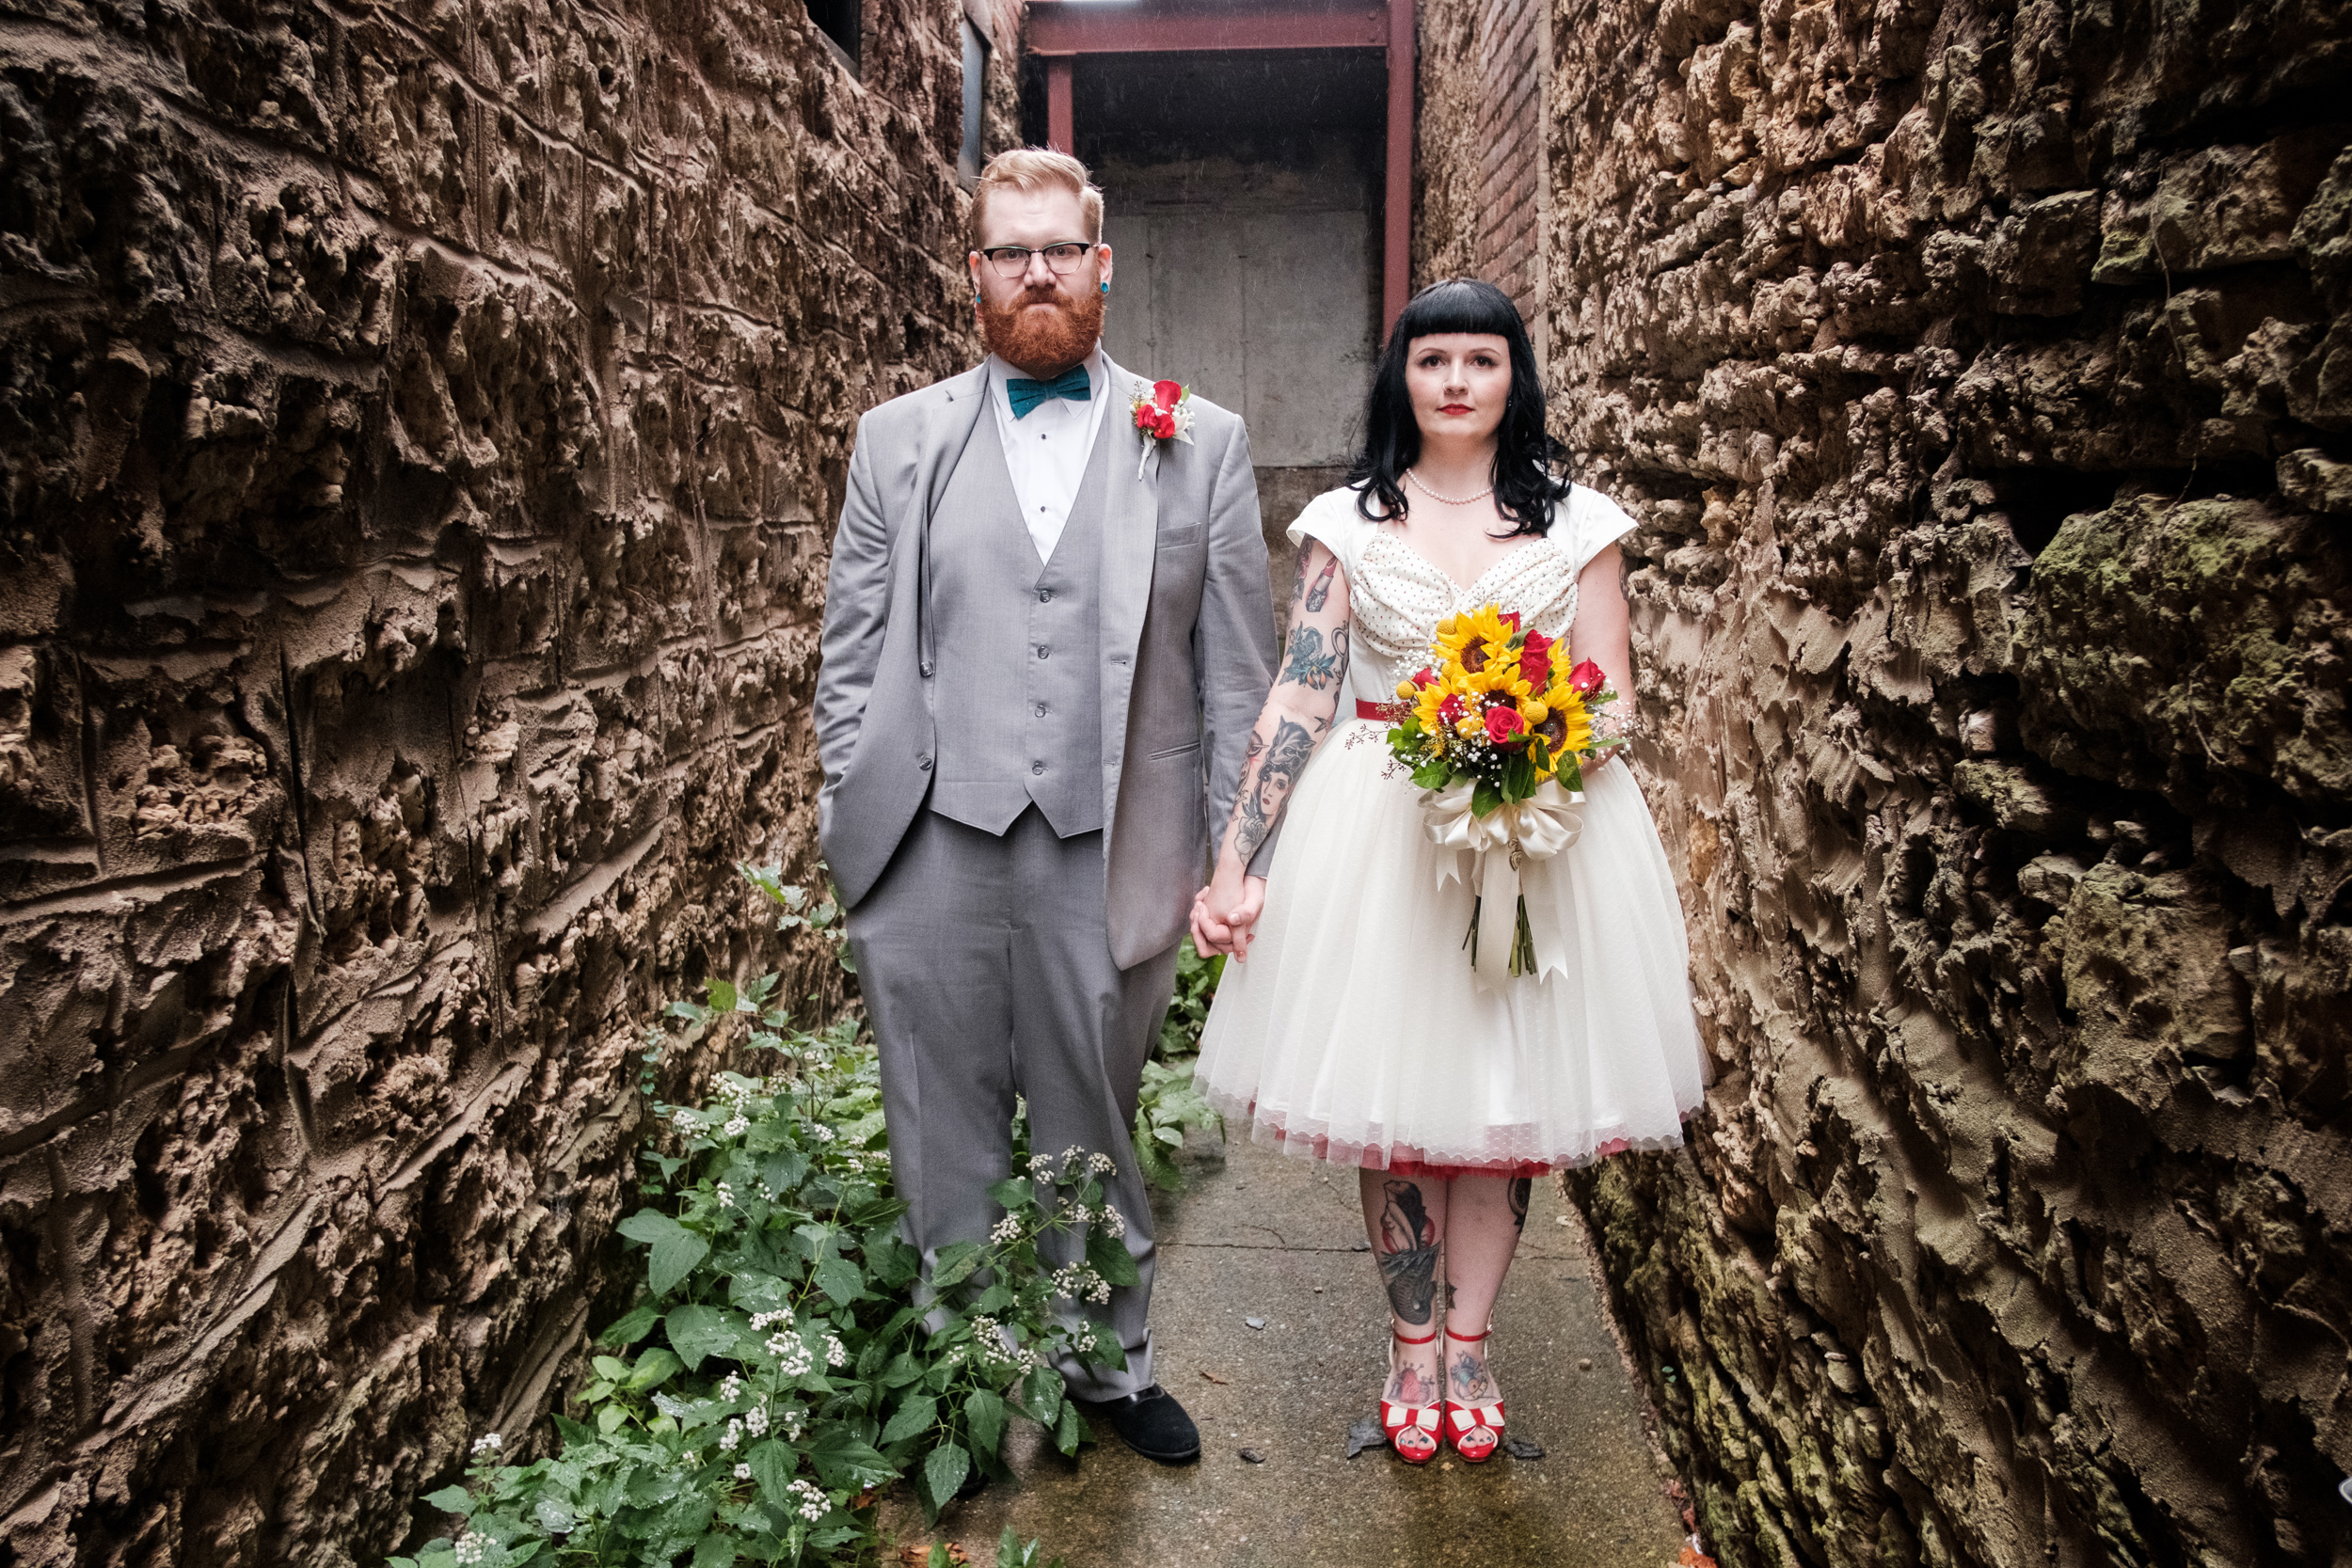 Christian & Sarah wedding photography by Brian milo-198.jpg